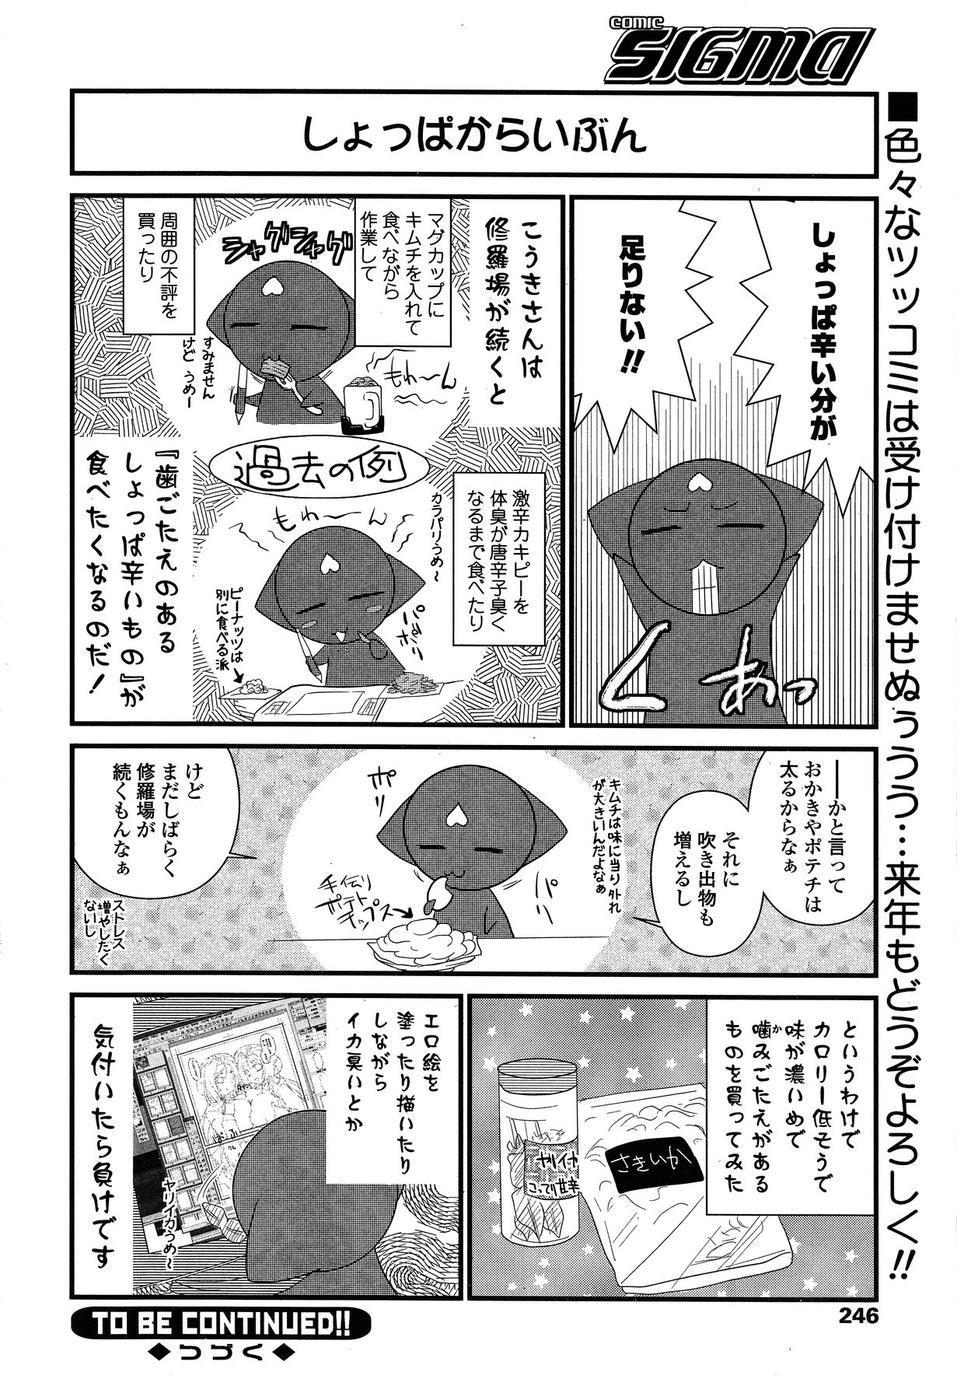 COMIC SIGMA 2009-01 Vol.28 150